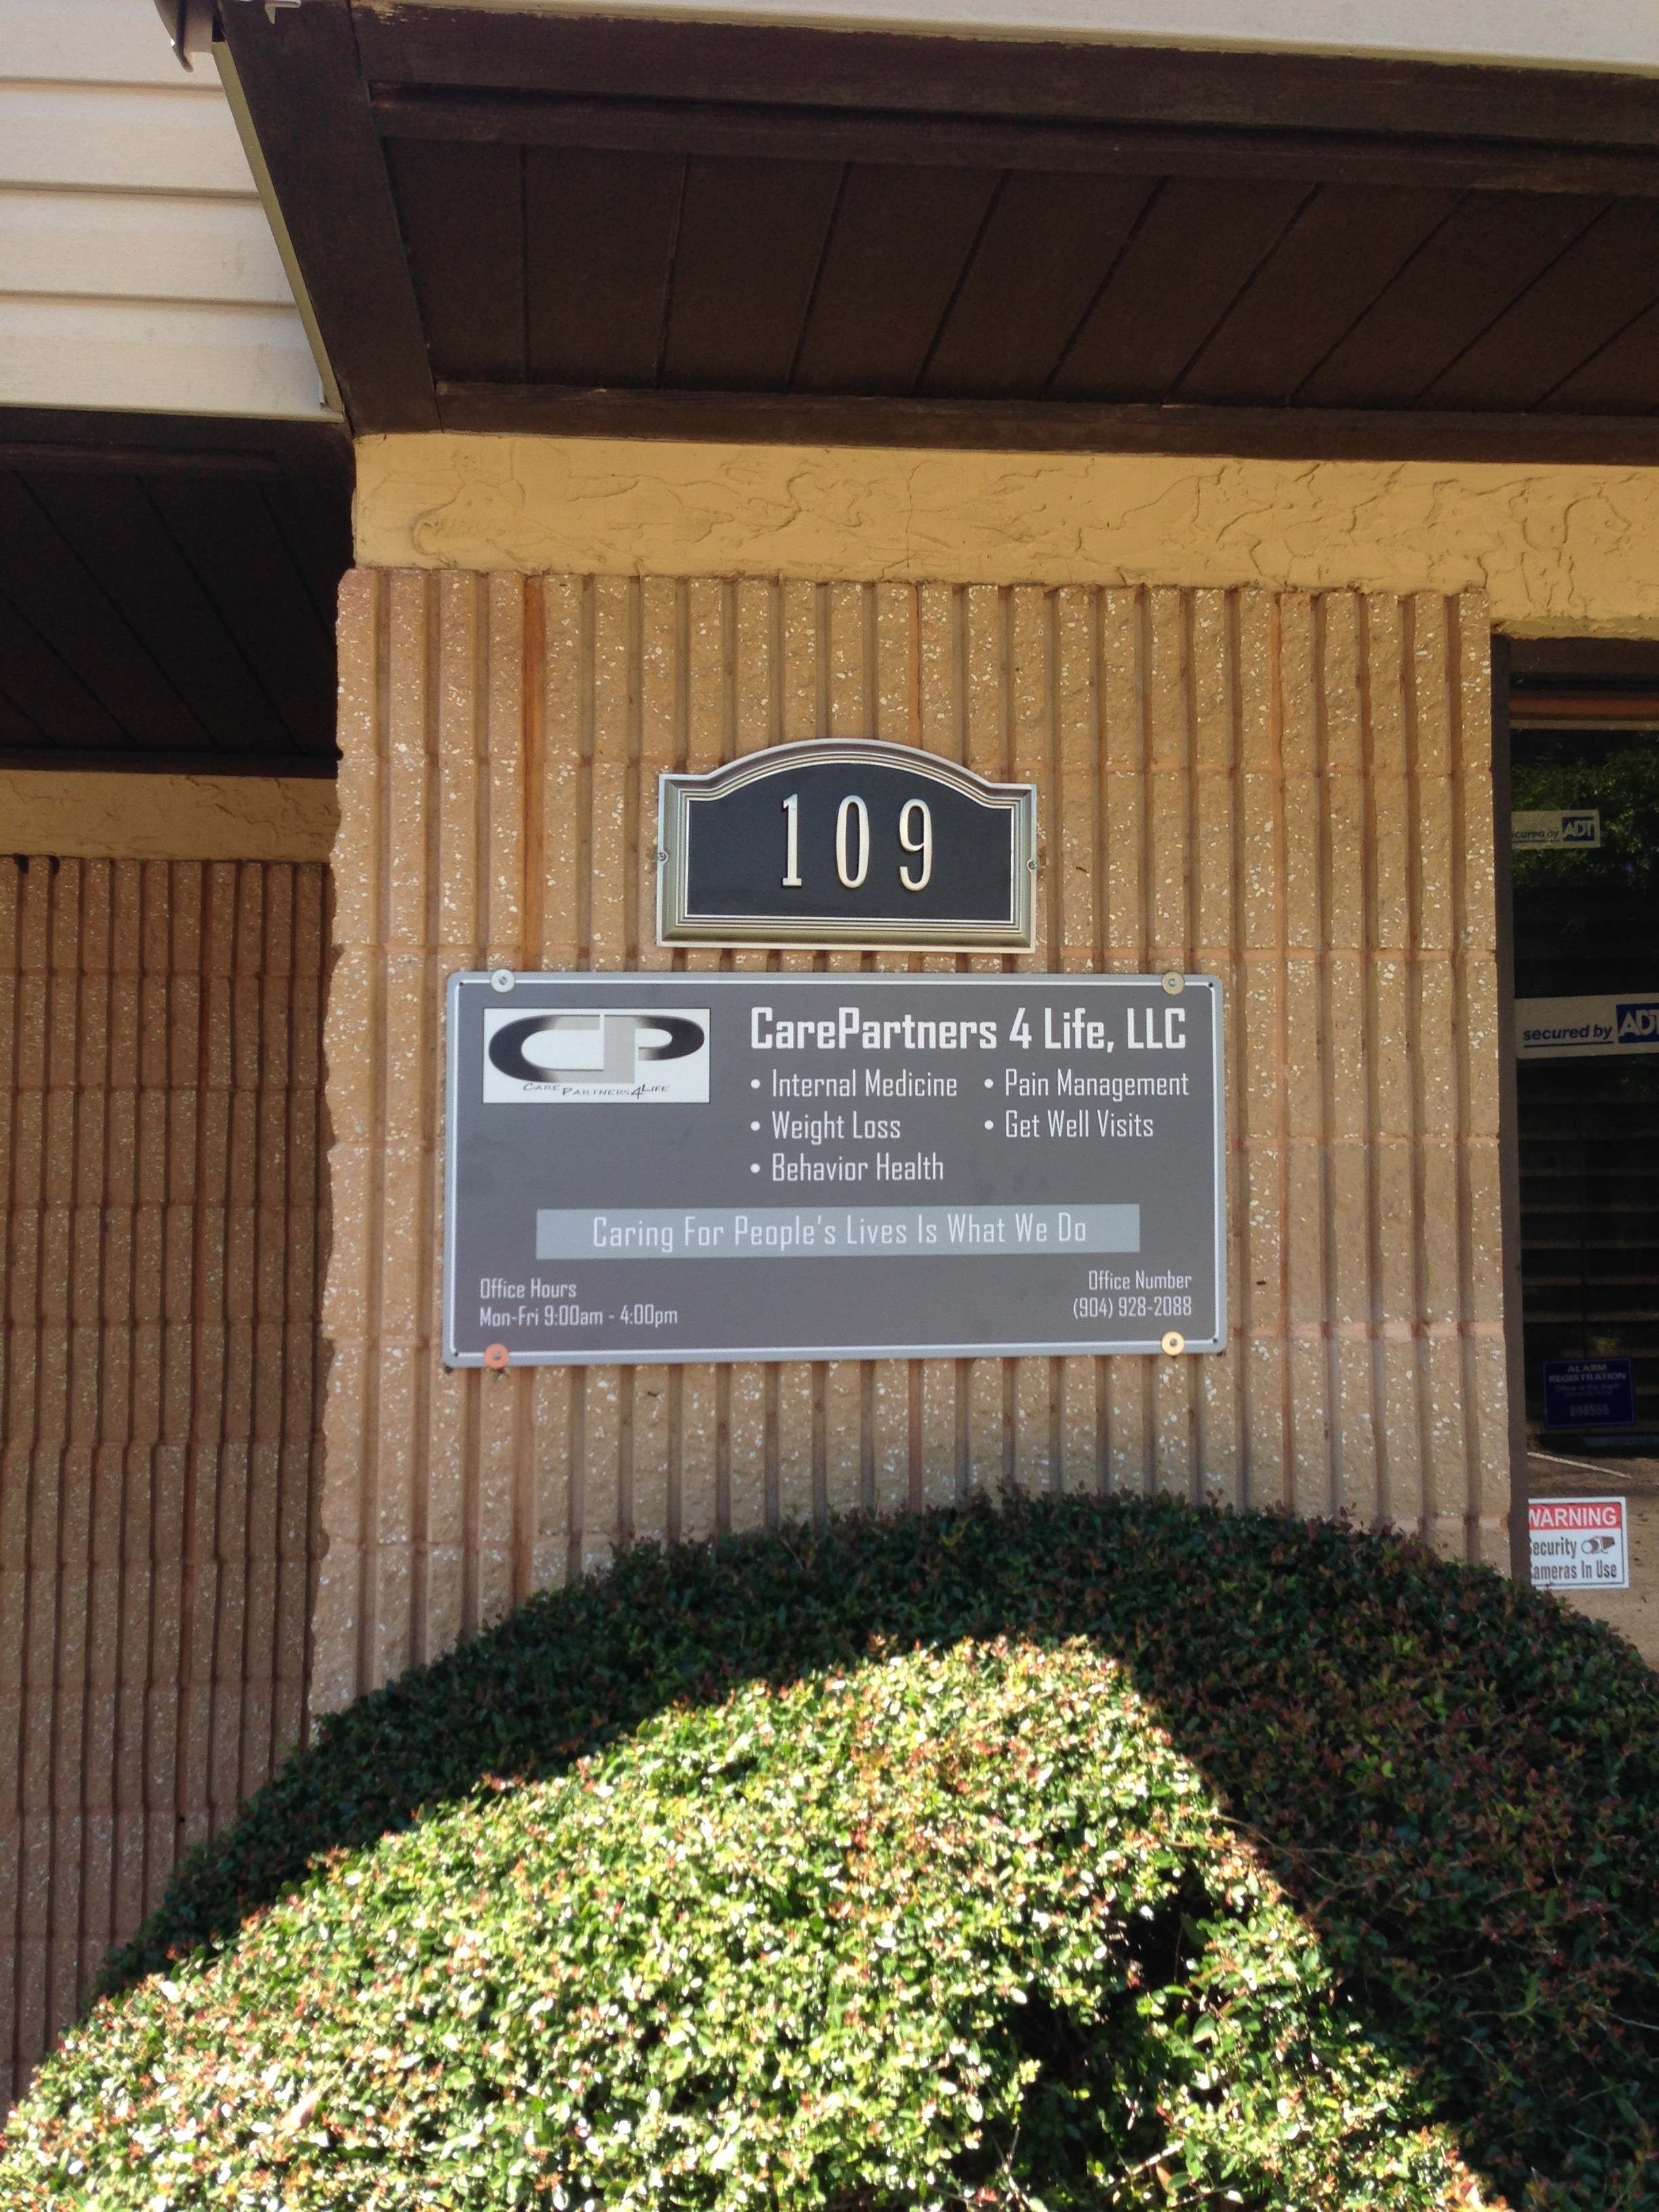 CarePartners 4 Life LLC 9770 Old Baymeadows Rd Ste 109 Jacksonville FL 32256